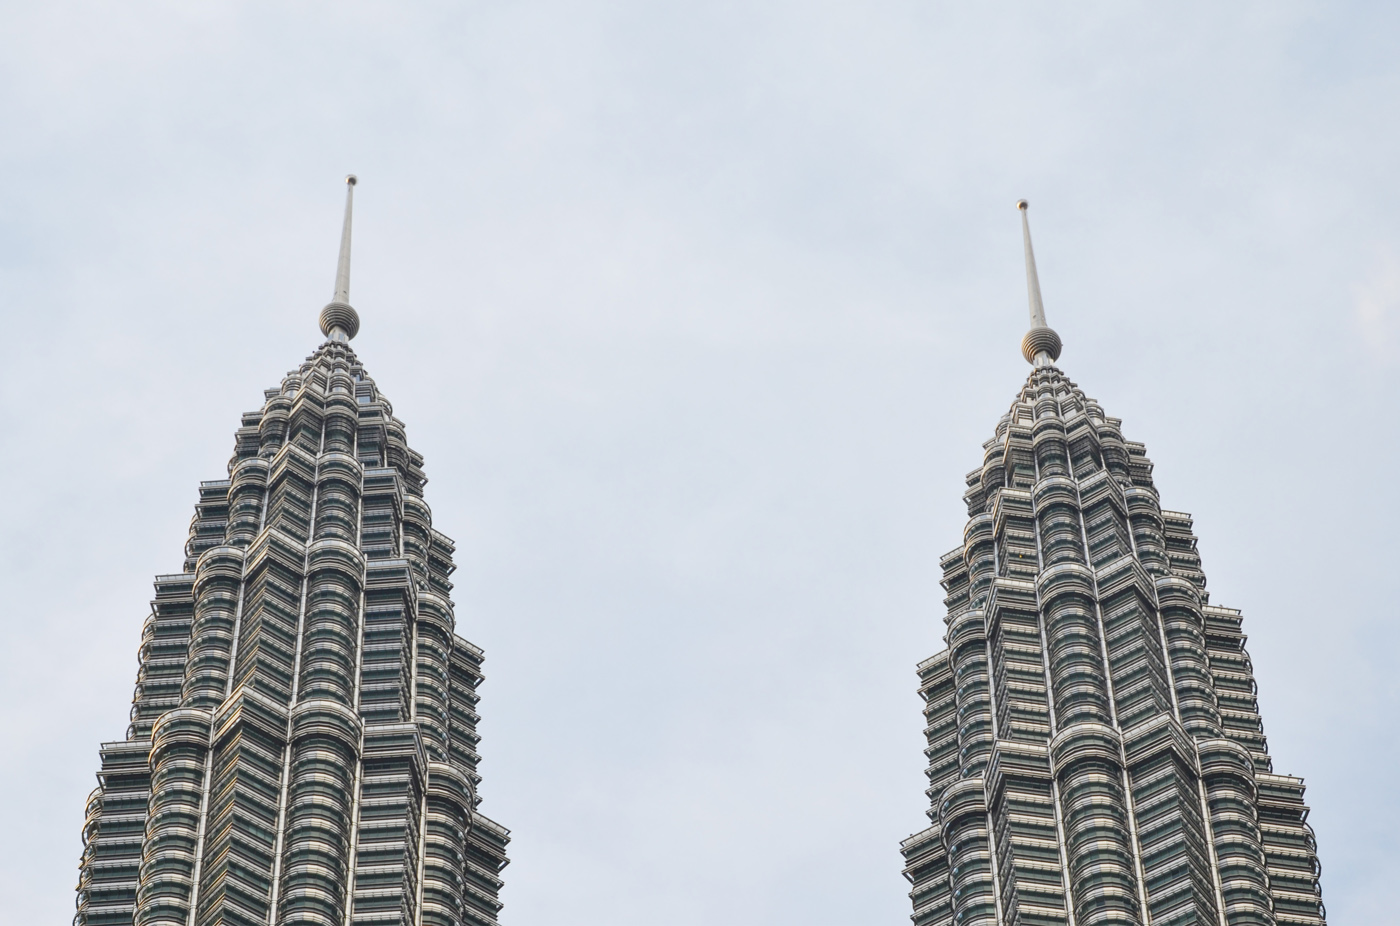 What-to-do-in-Kuala-Lumpur-petronas-tower